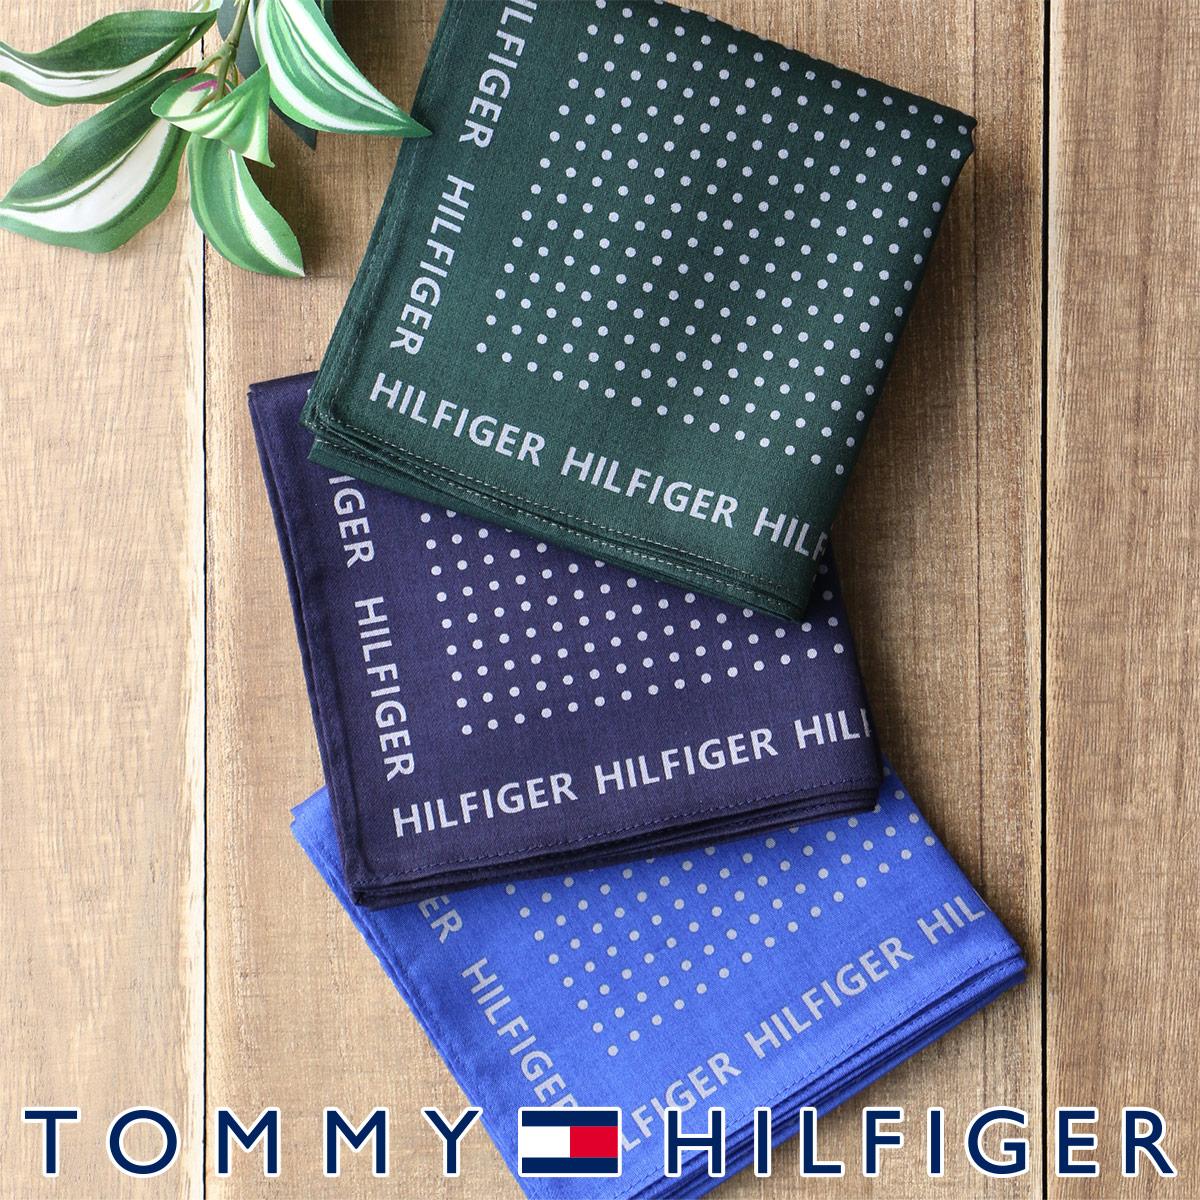 TOMMY HILFIGER|トミーヒルフィガー ブランド ラッピングOK ドット柄 綿100% ハンカチ 男性 紳士 メンズ プレゼント 贈答 ギフト 入学祝 就職祝 2582-150【ゆうパケット・4点まで】